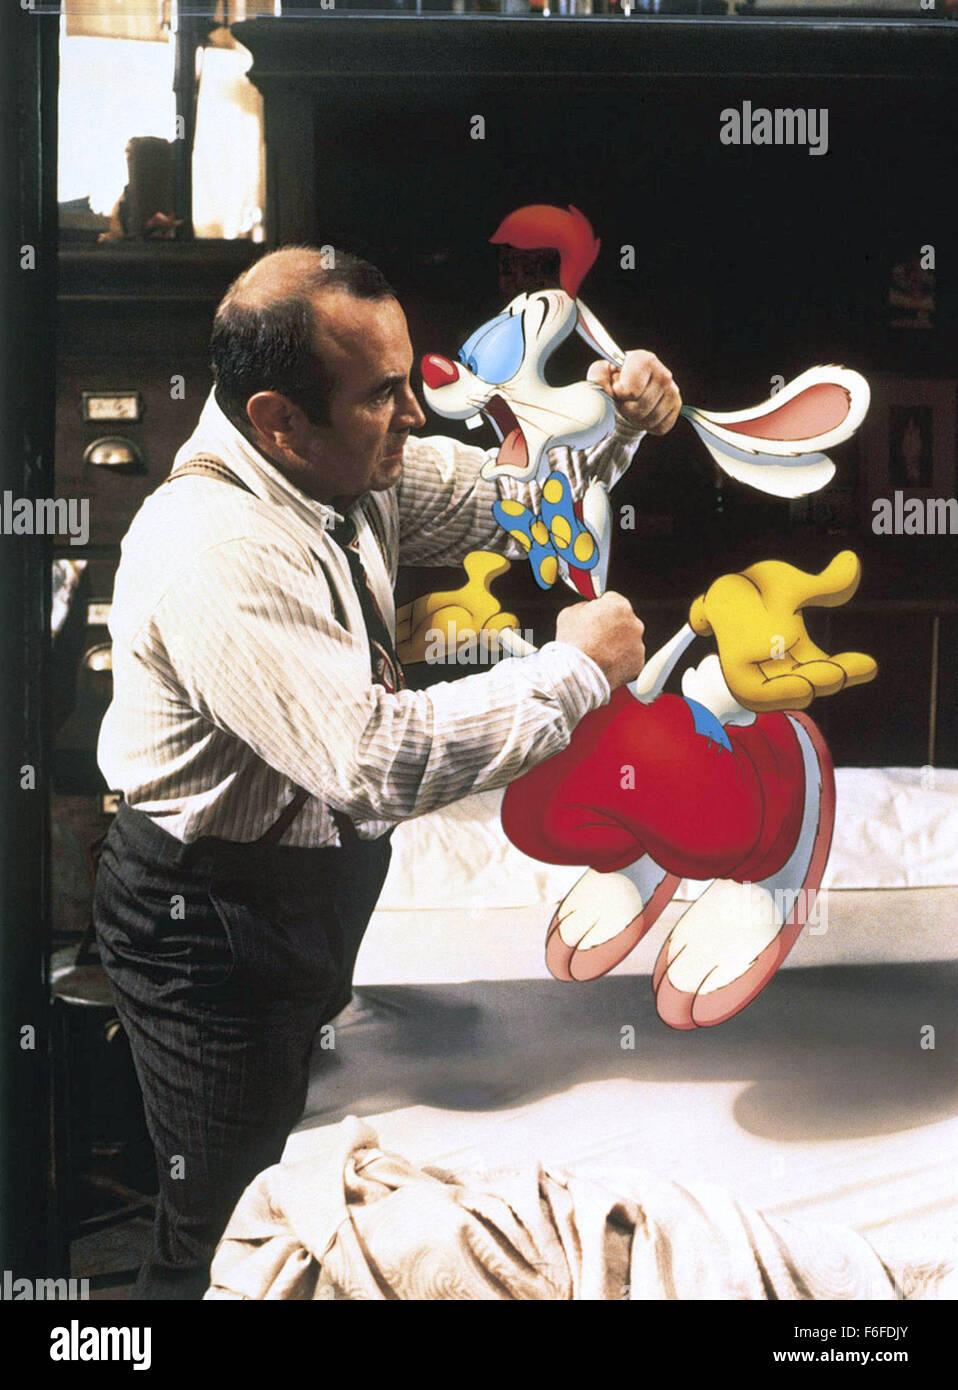 RELEASE DATE: June 21, 1988. Film Title: Who Framed Roger Rabbit ...